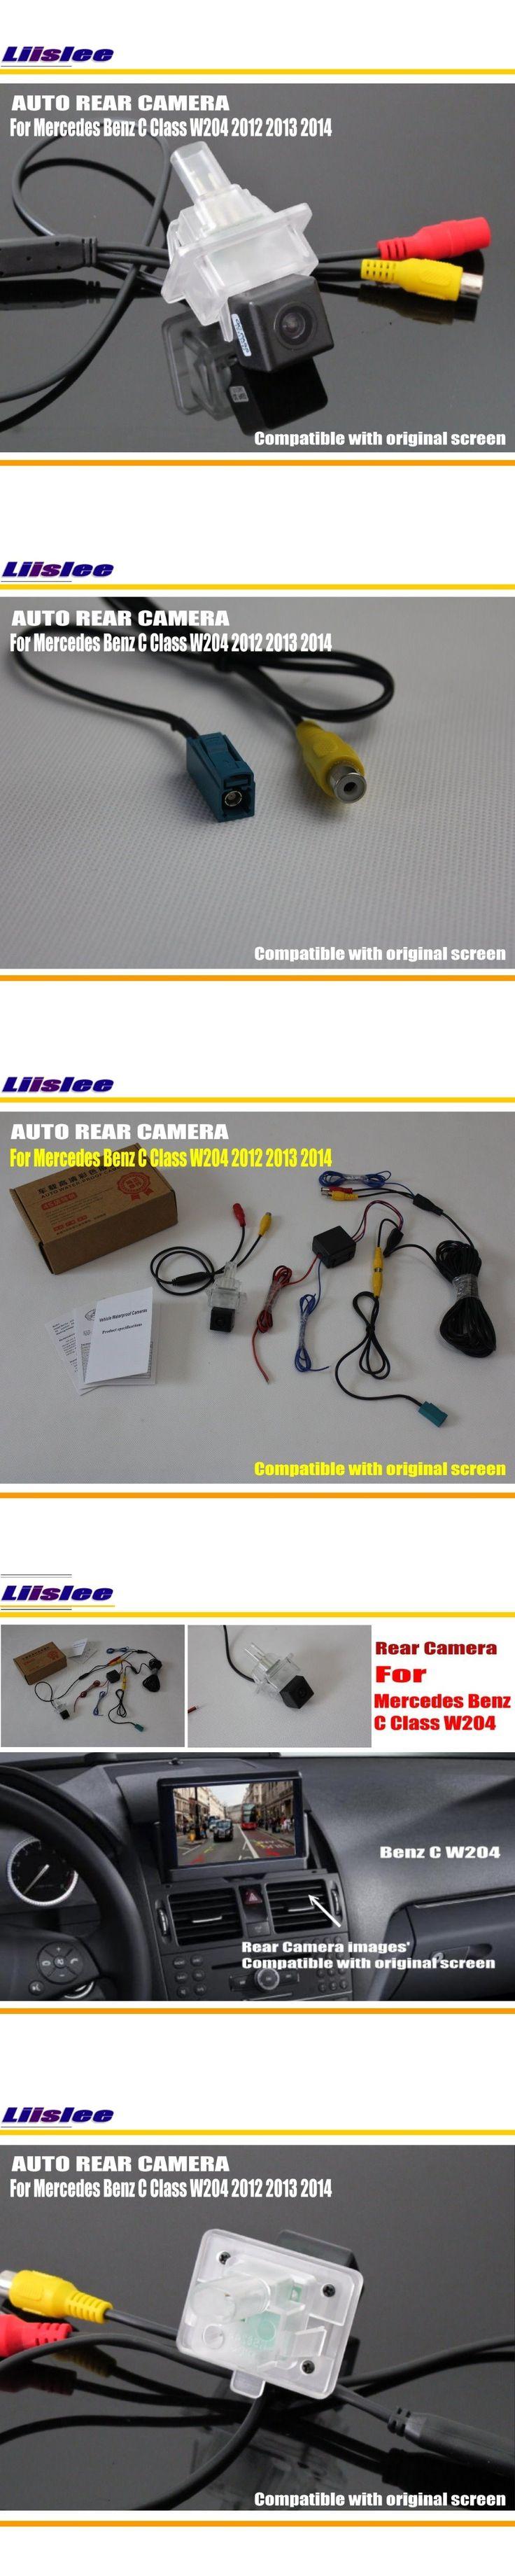 Rear View Camera / Back Up Reverse Camera / RCA & Original Screen Compatible / For Mercedes Benz C Class W204 2012 2013 2014